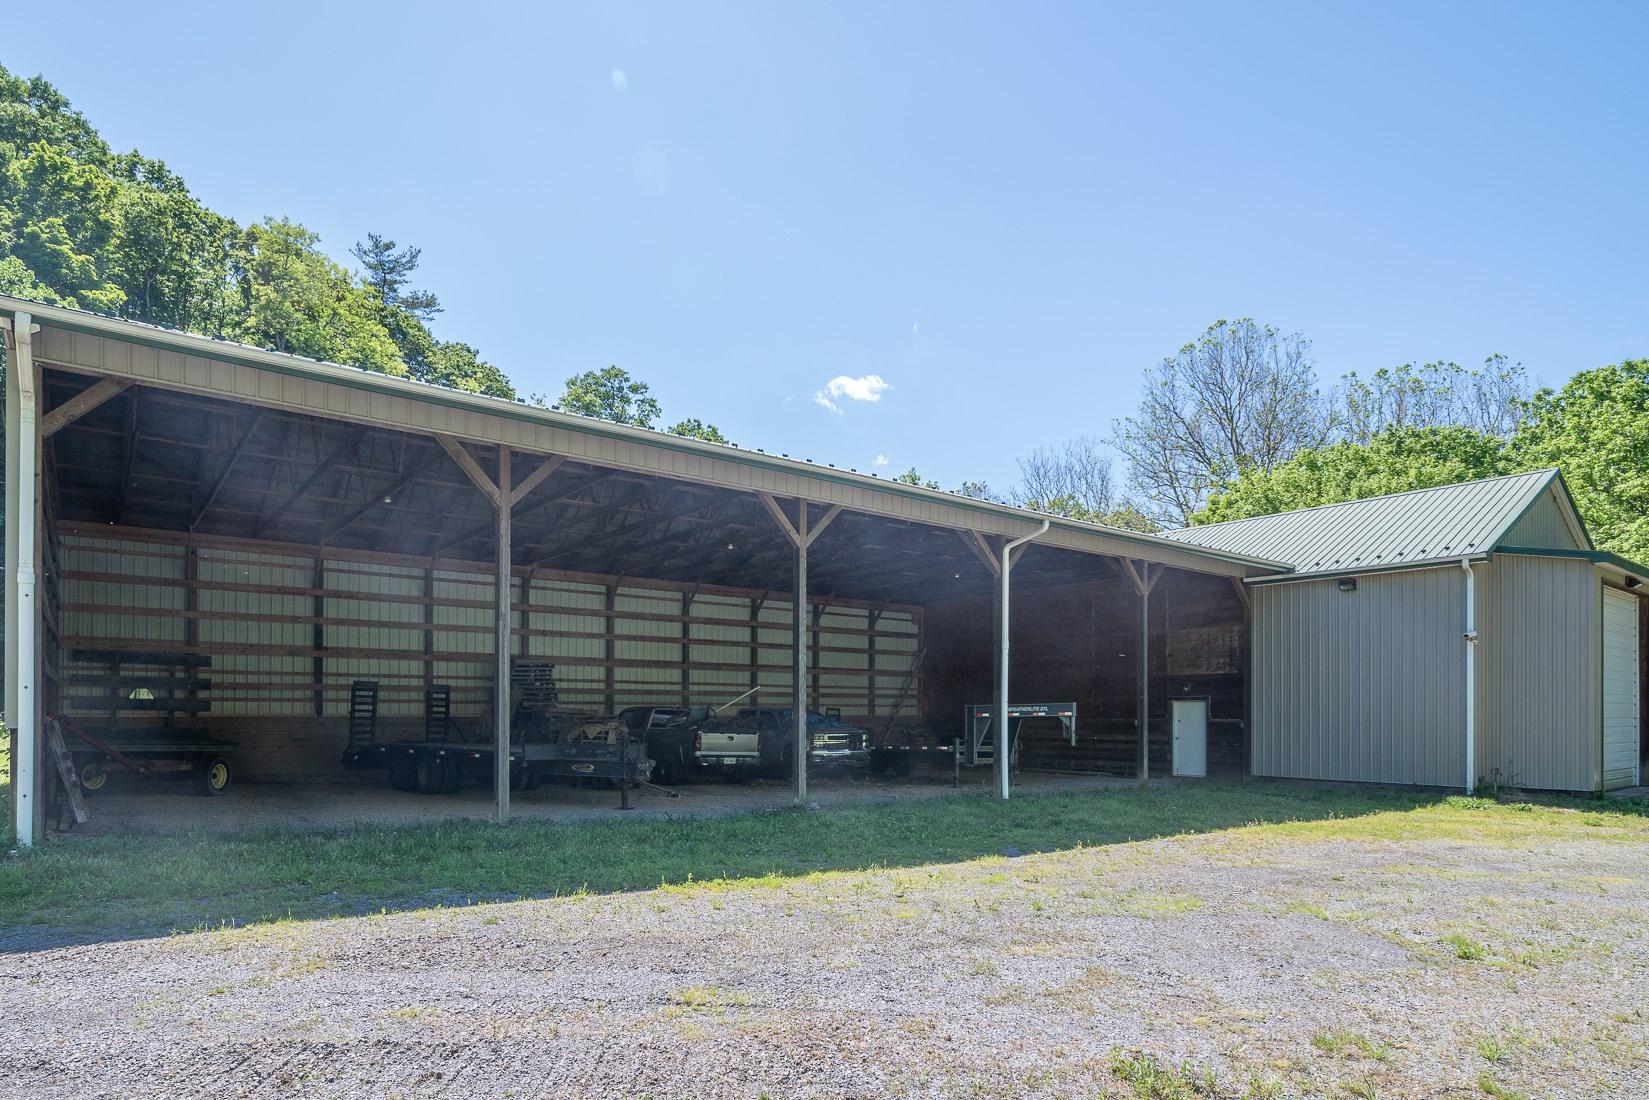 Storage area of RV barn